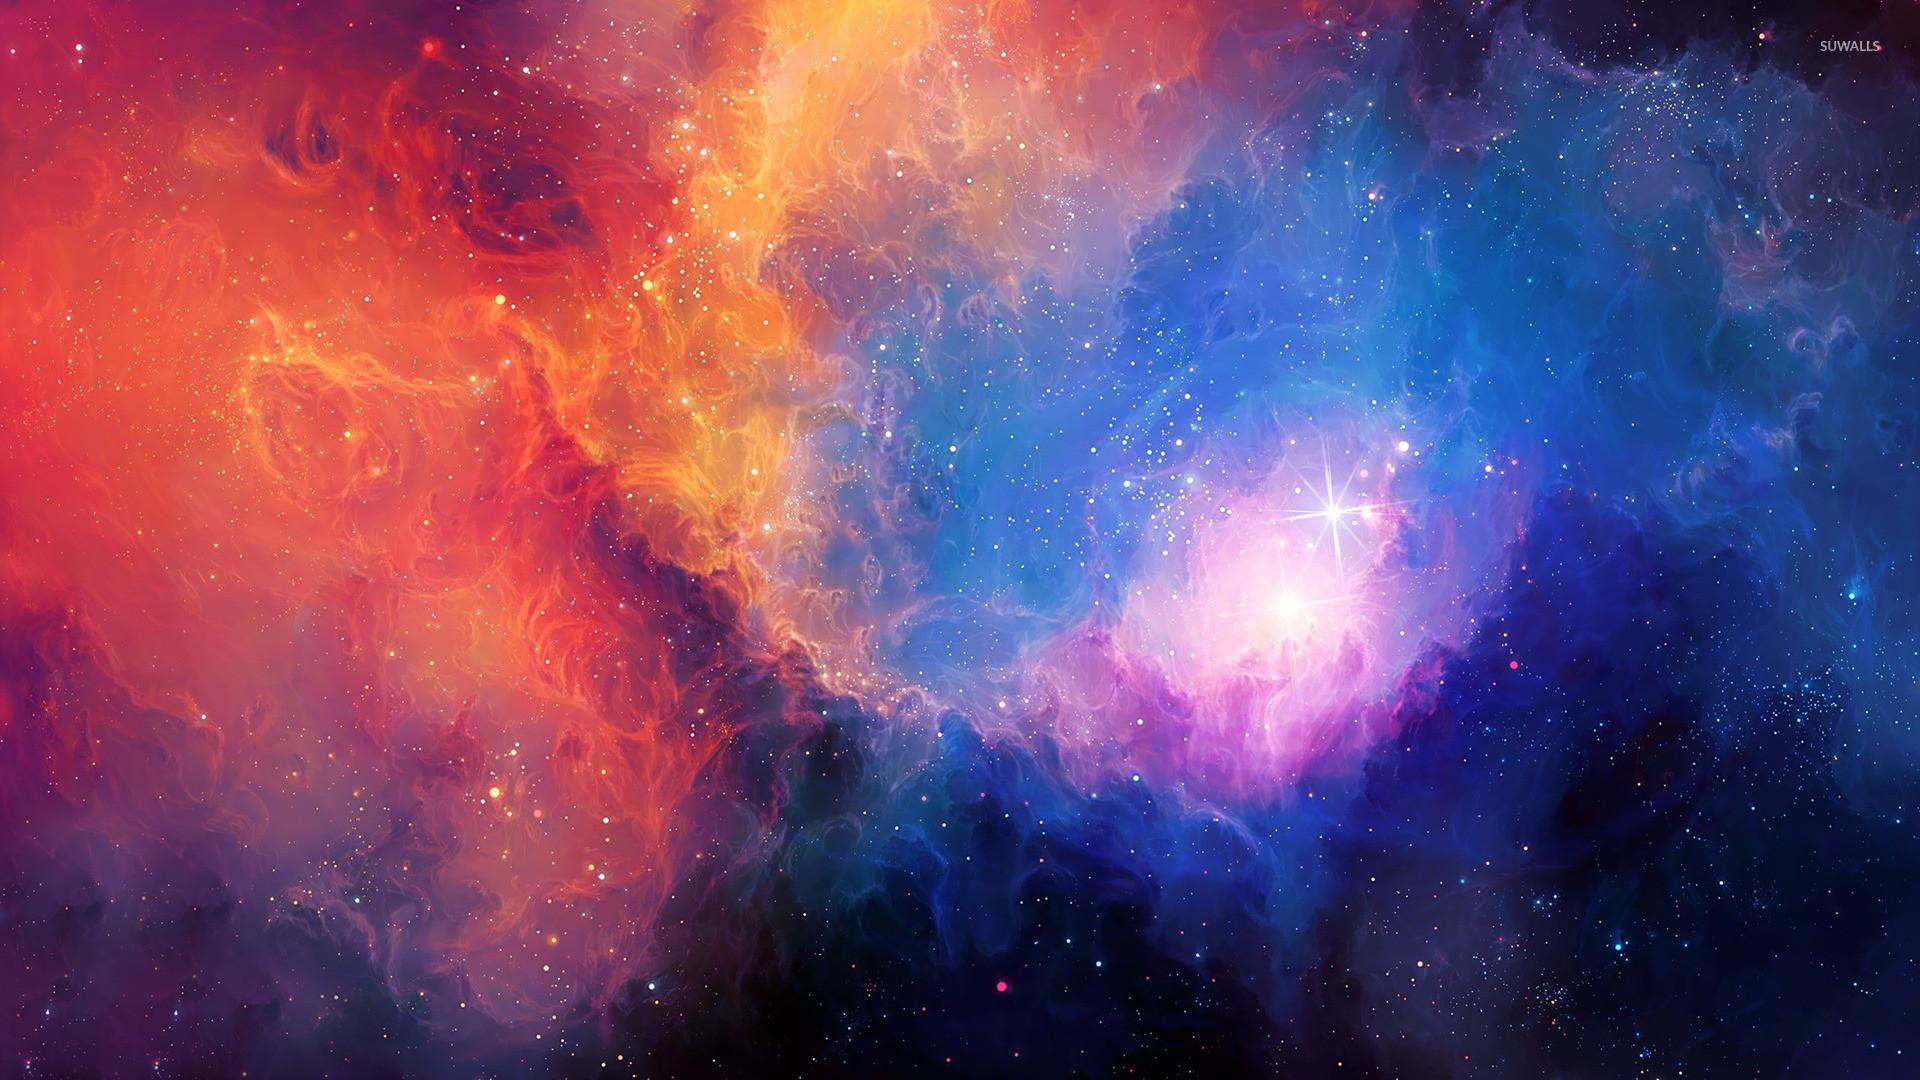 Colorful nebula wallpaper jpg